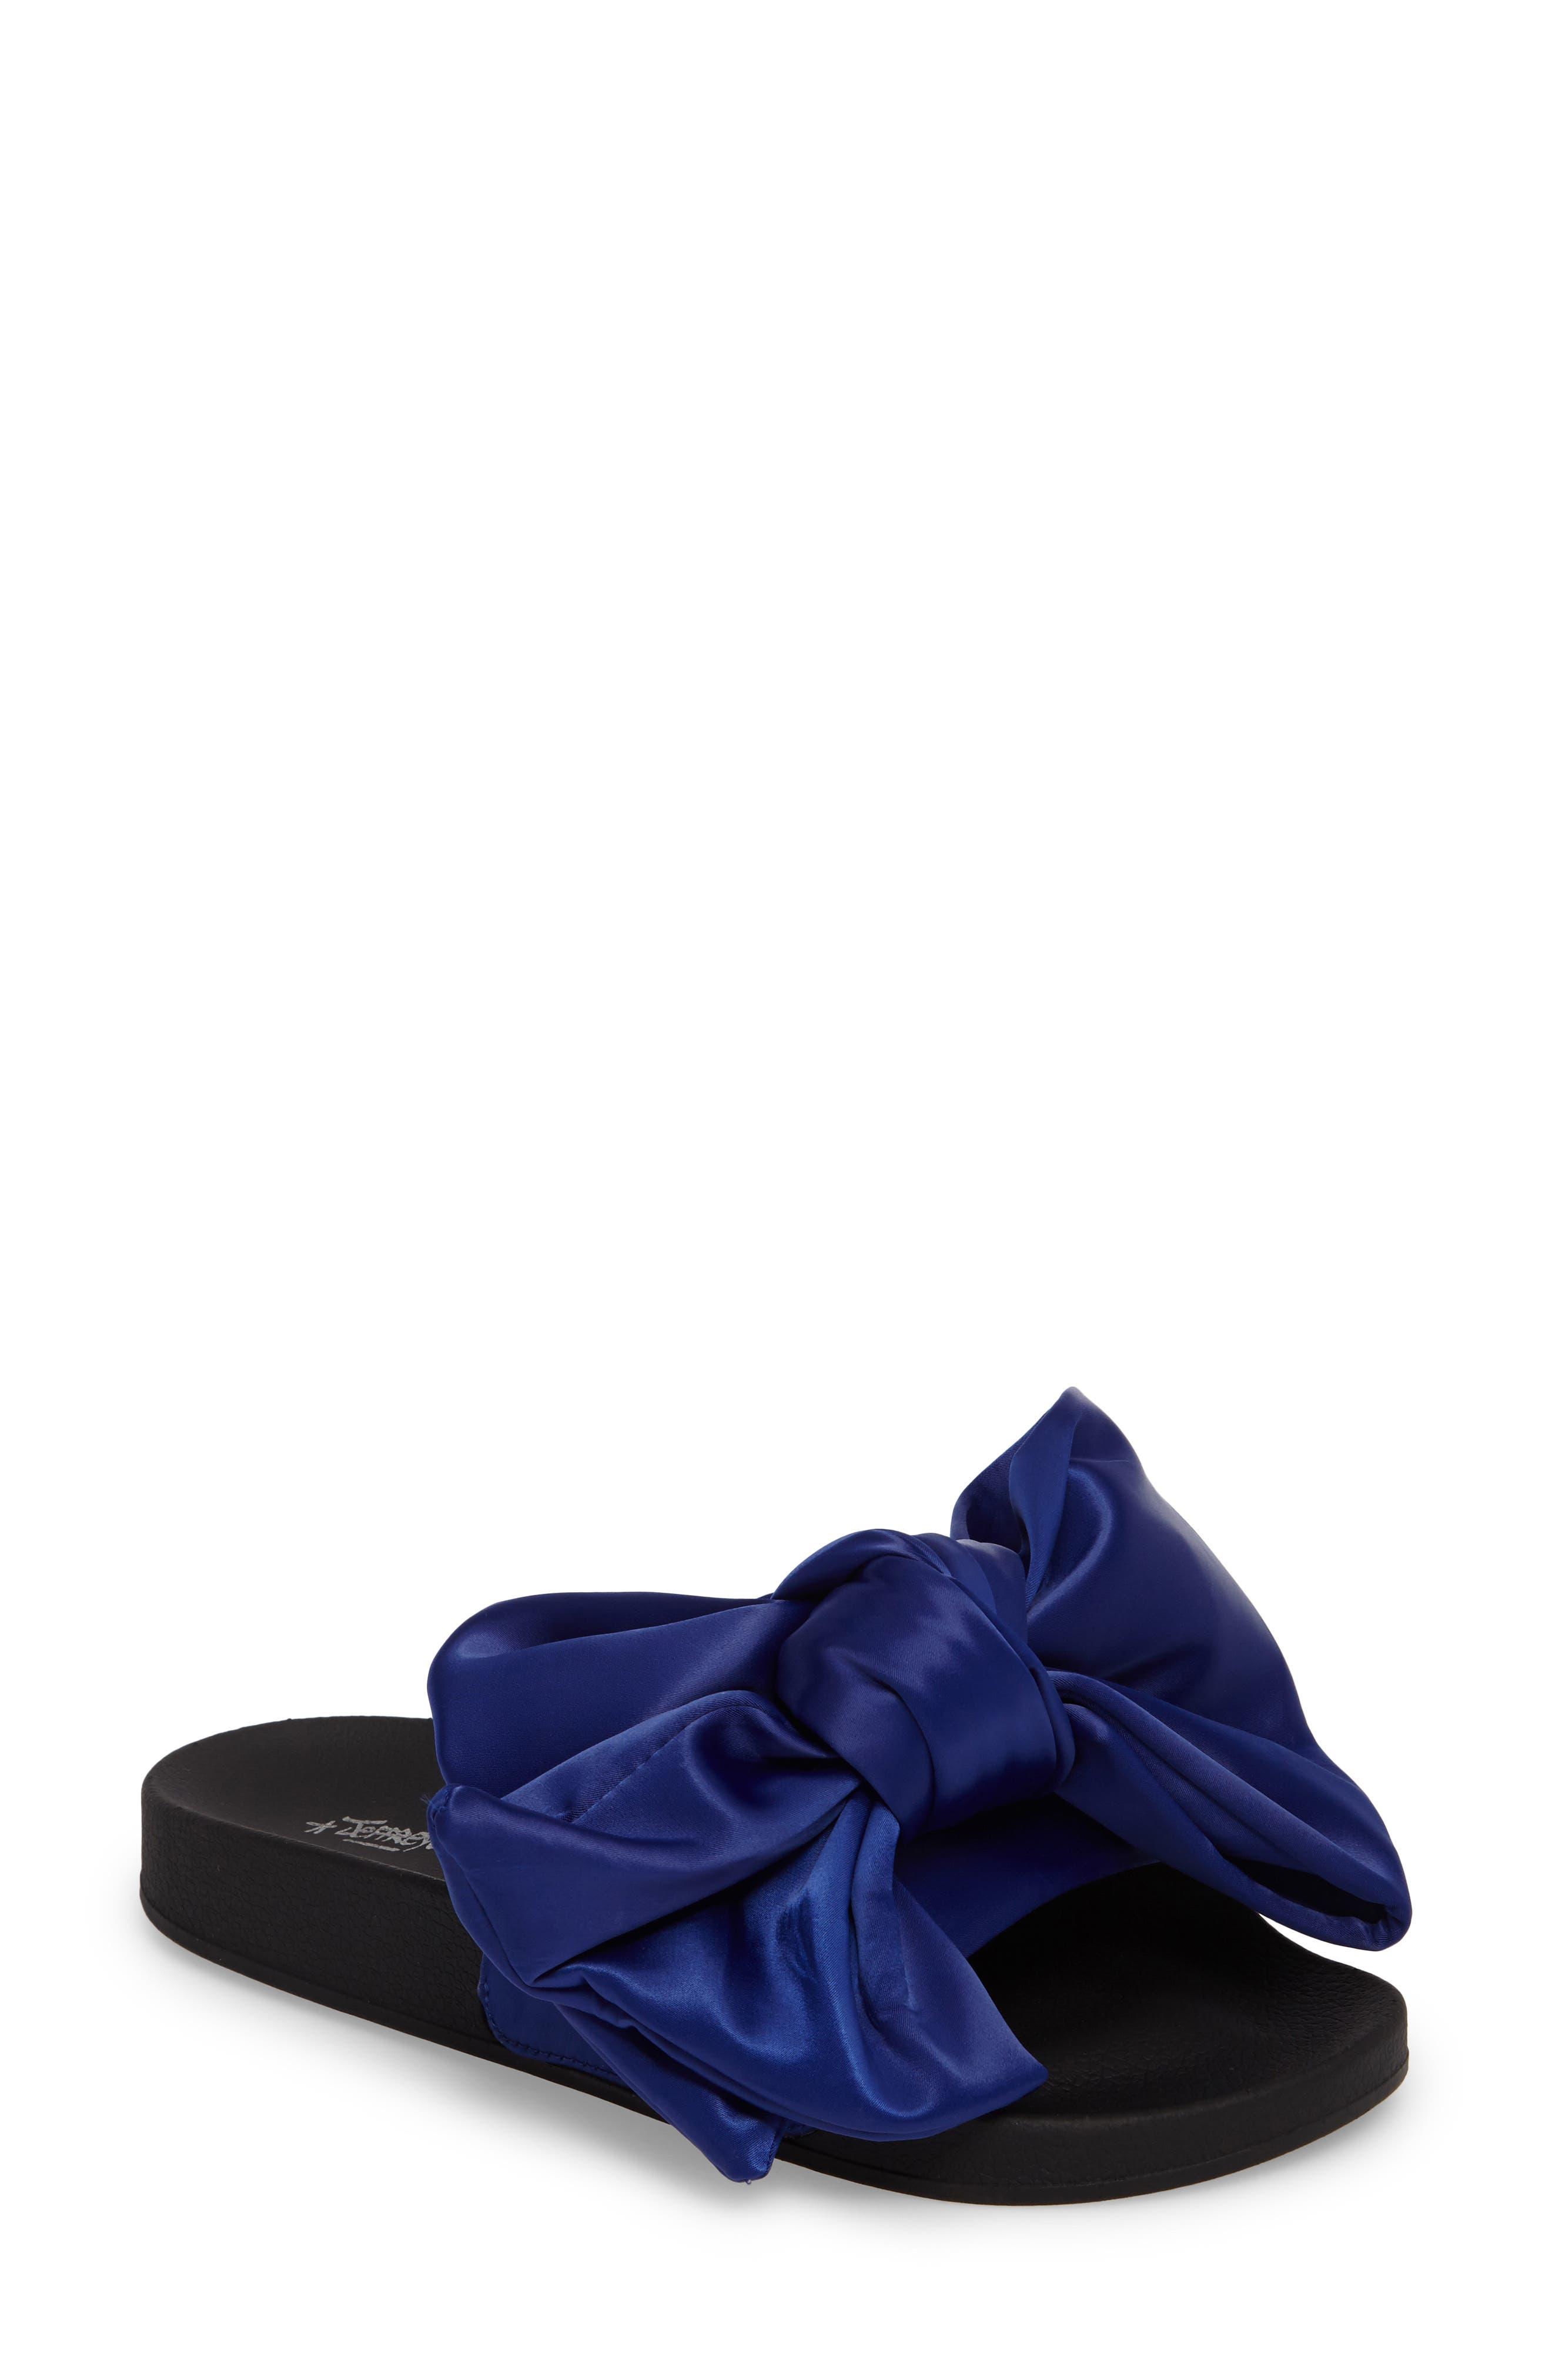 JEFFREY CAMPBELL Jova-Bow Slide Sandal